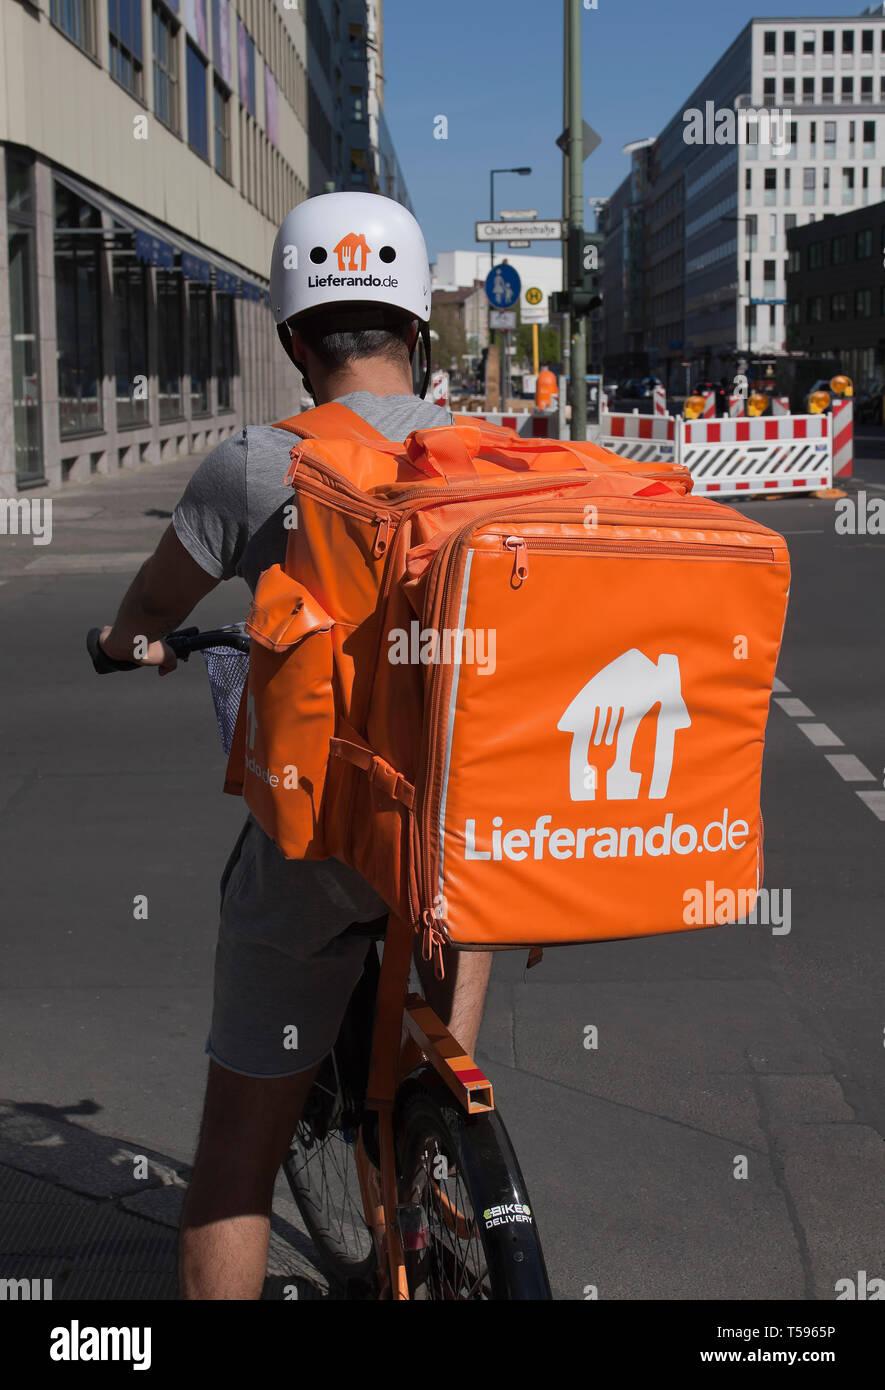 Bicyclist of delivery service Lieferando in Berlin Stock Photo